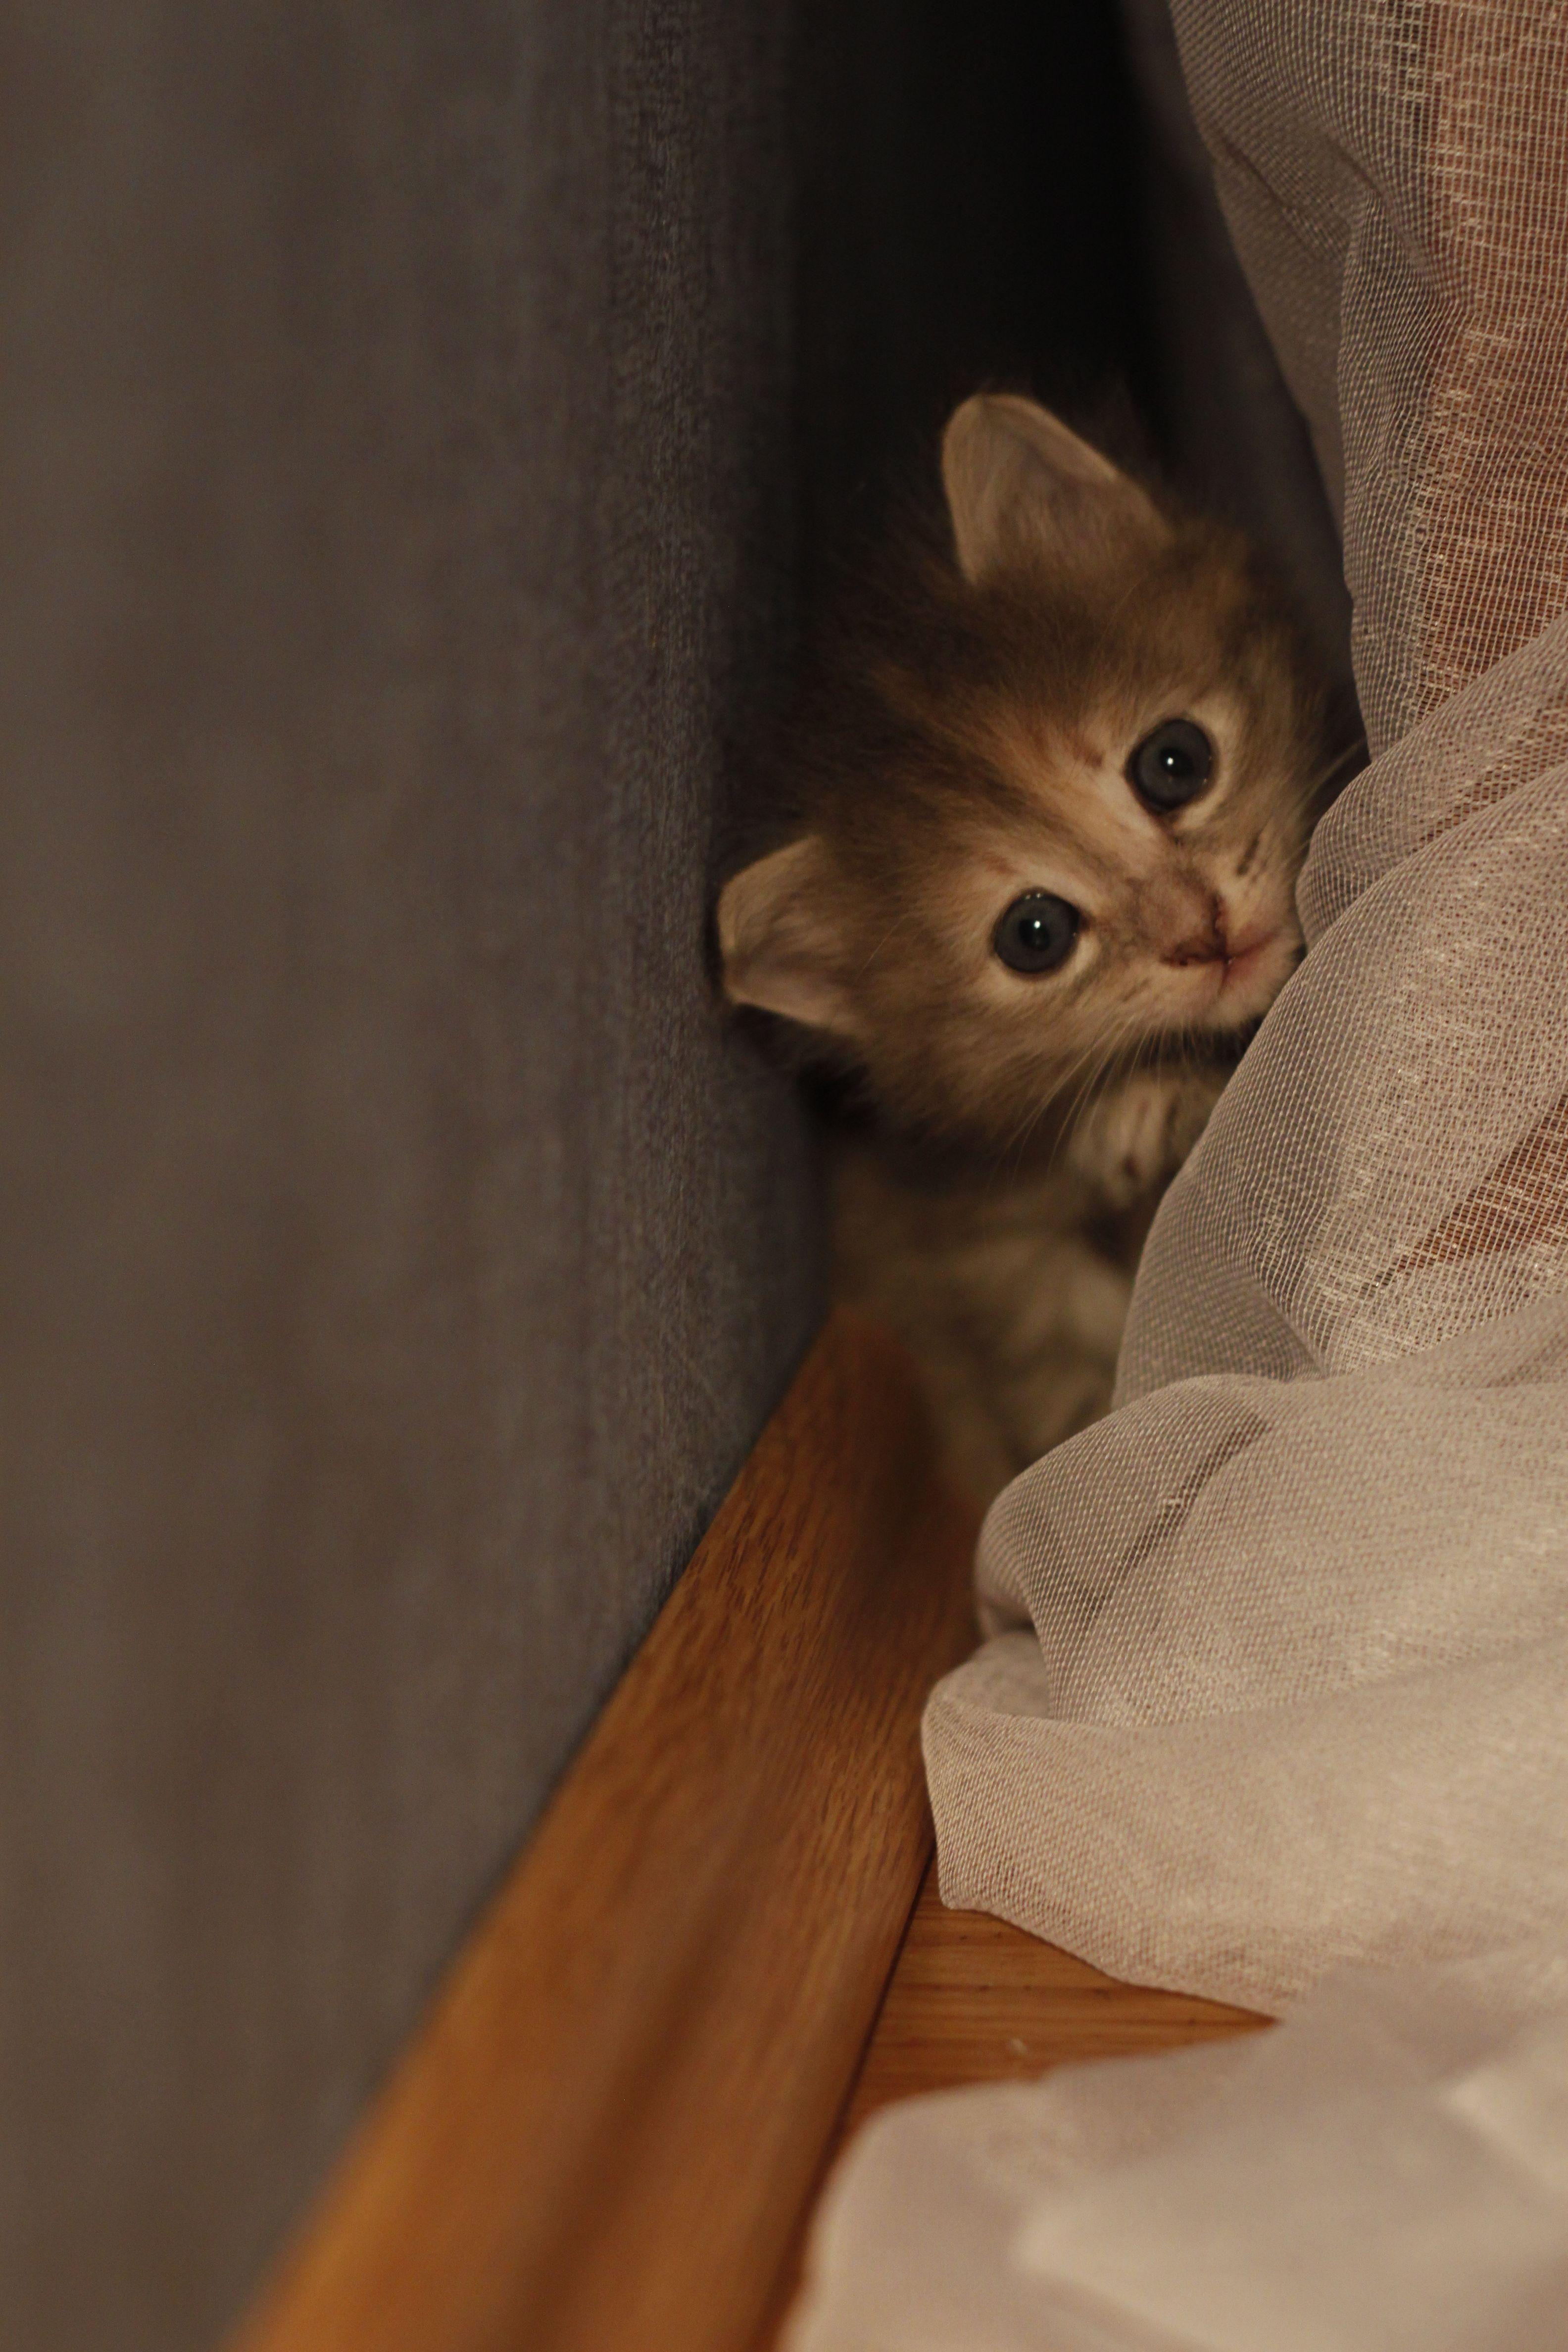 Hiding Kitten Cute Little Animals Kittens Cutest Baby Animals